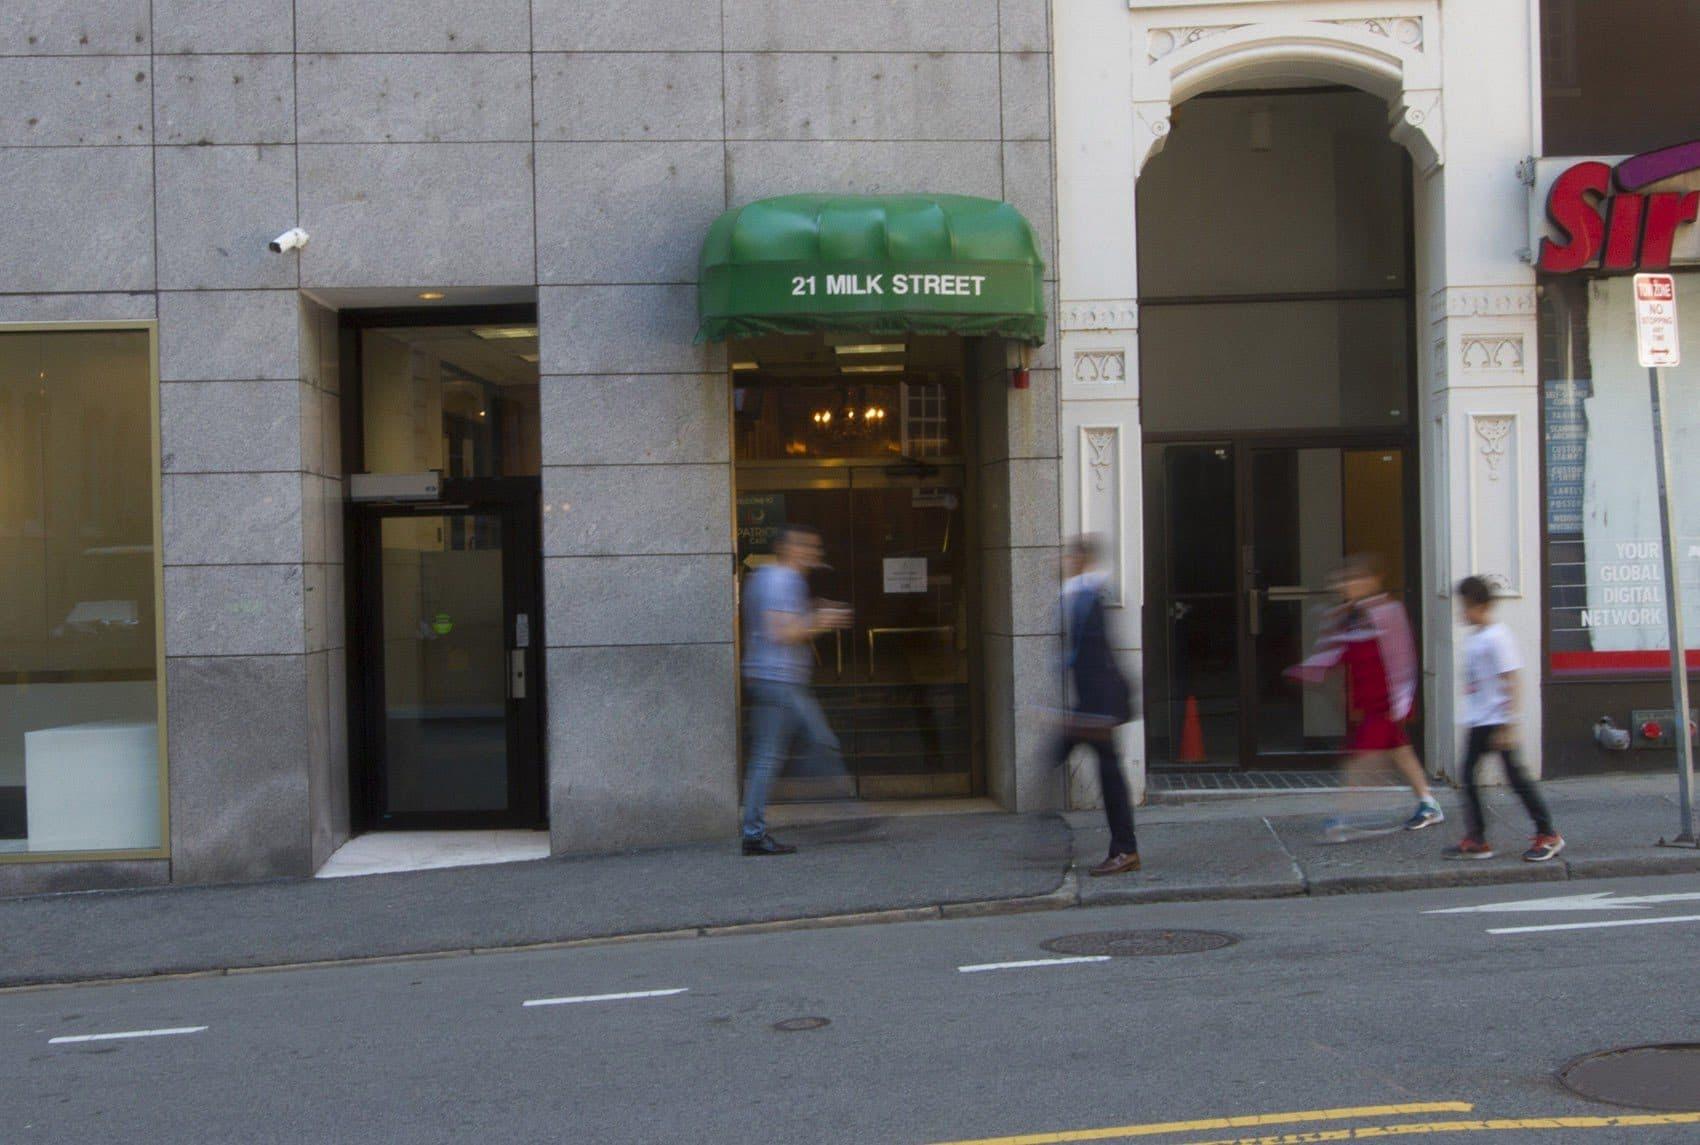 The outside of Boston's first medical marijuana dispensary at 21 Milk St. (Joe Difazio for WBUR)